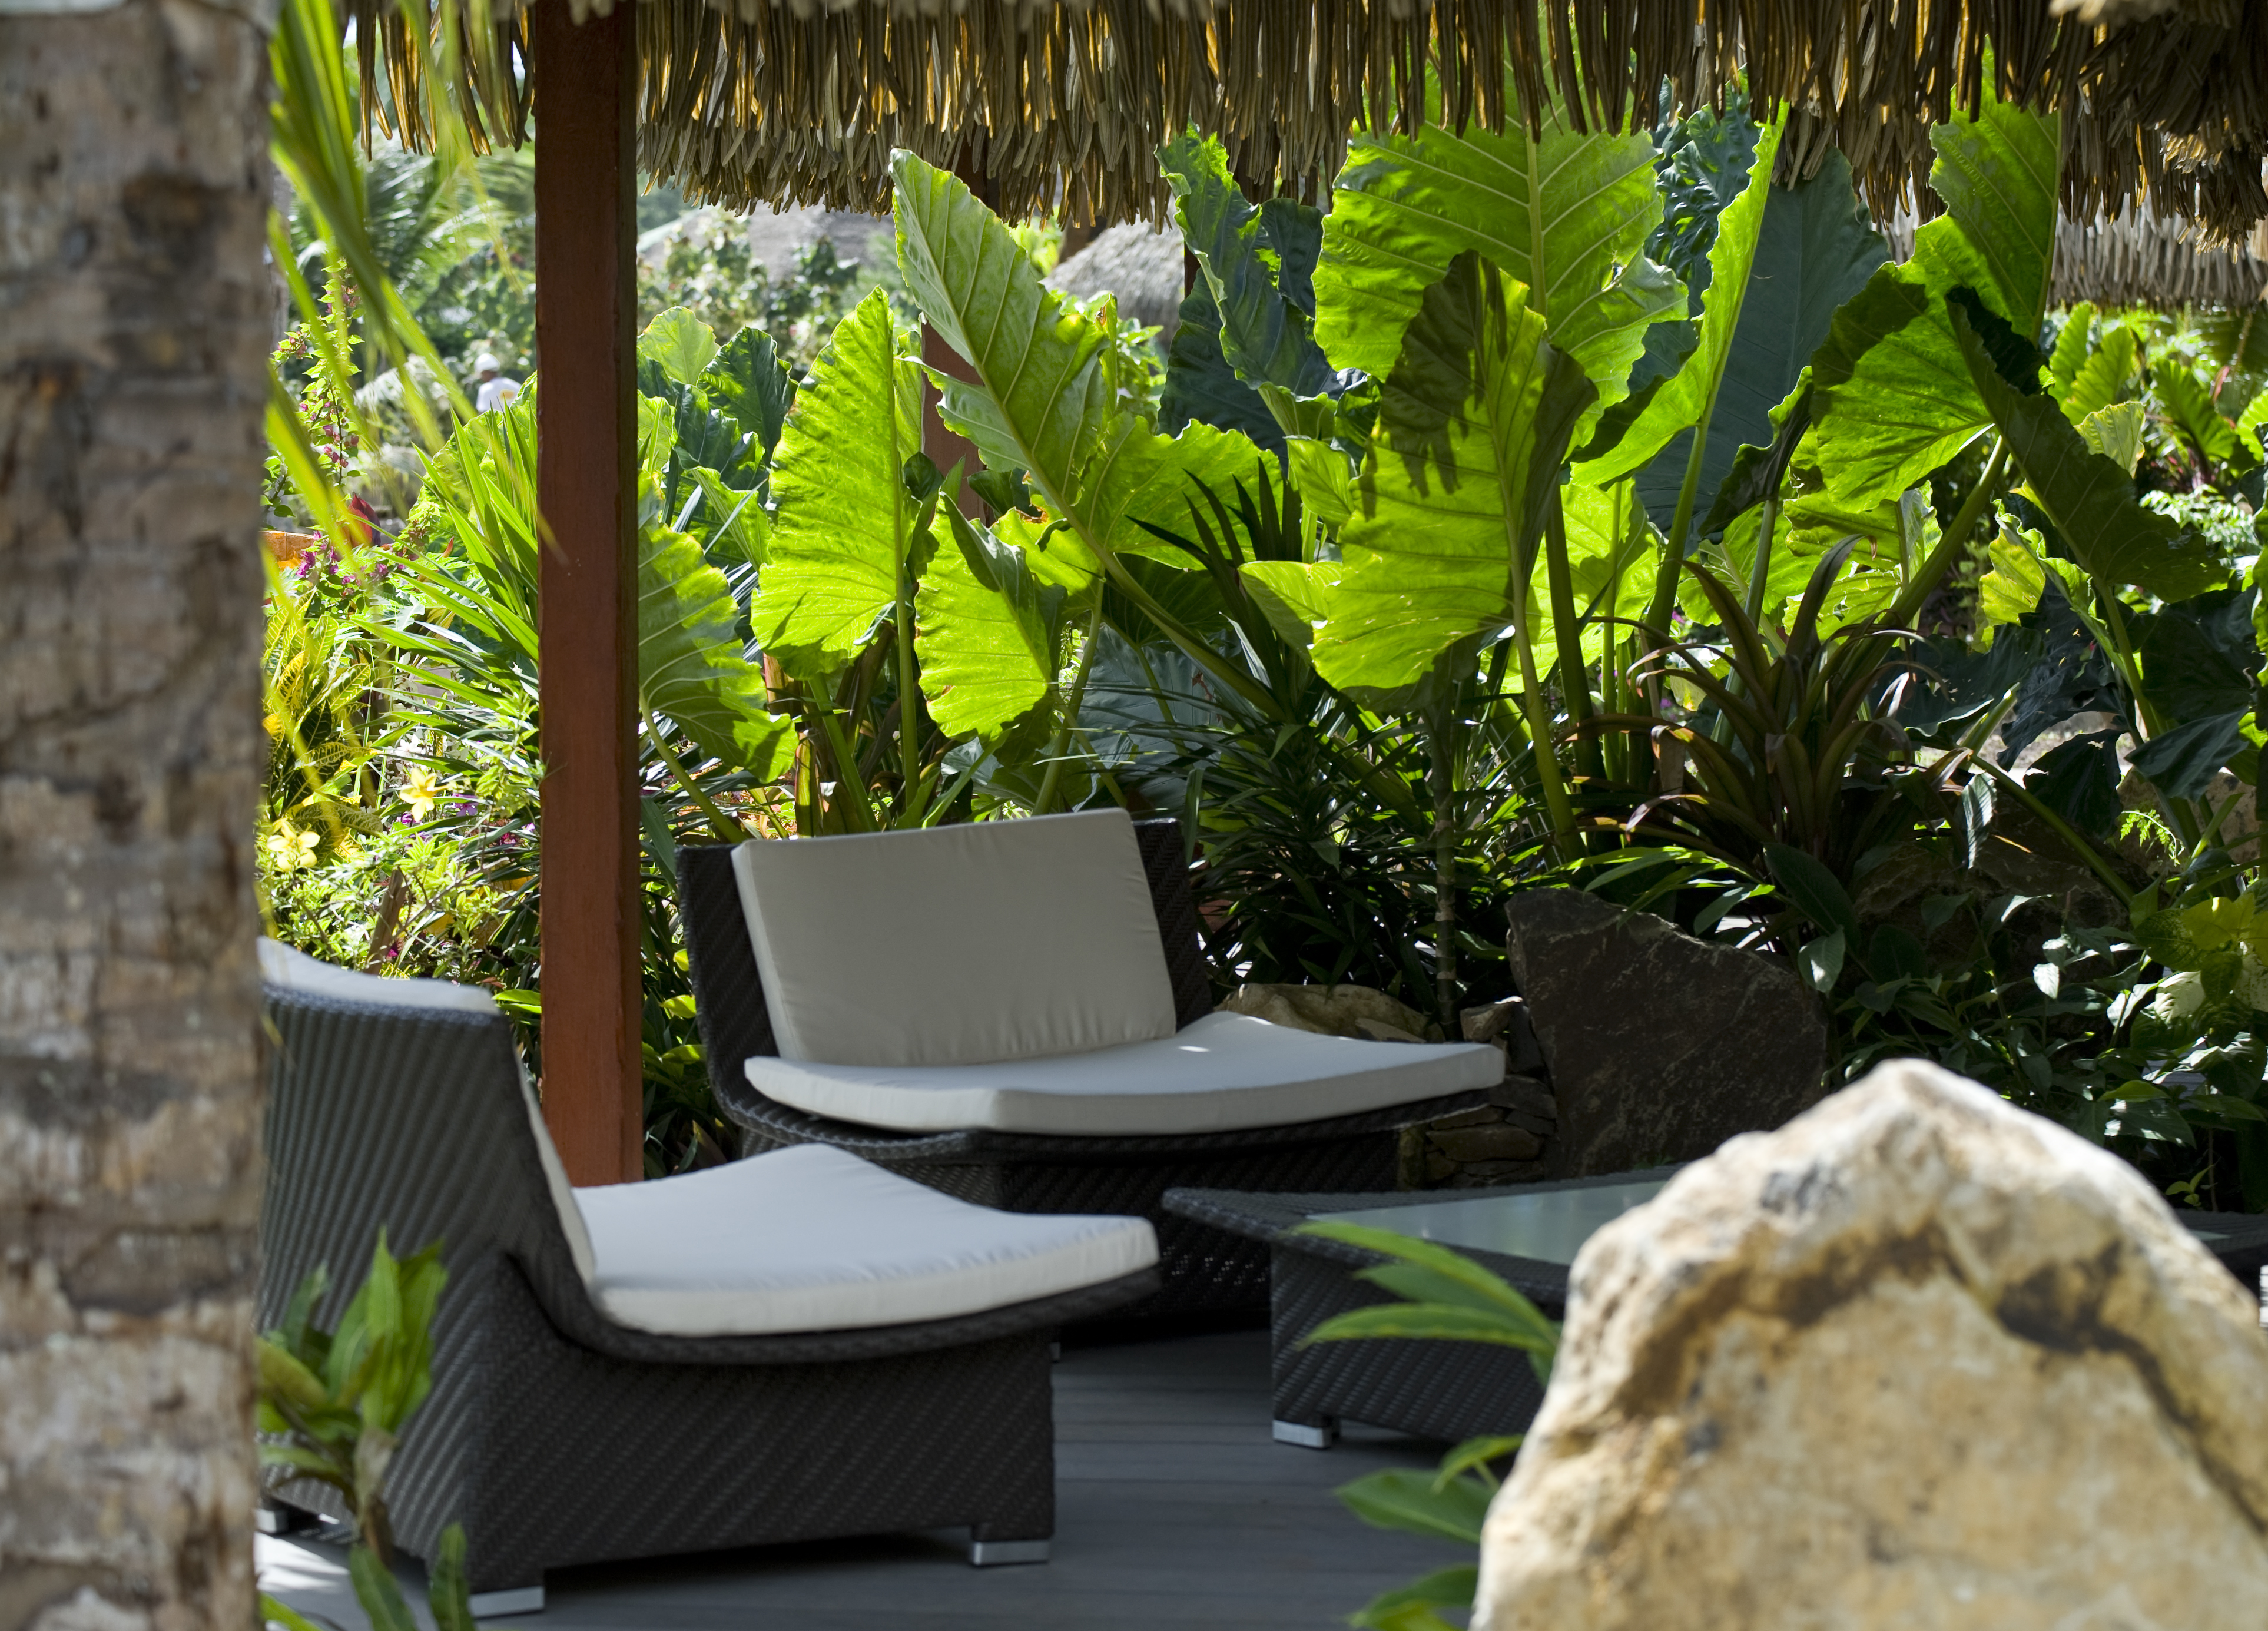 https://tahititourisme.com/wp-content/uploads/2017/11/HUH-Maitai-Premium-Garden-Terrace-5.jpg